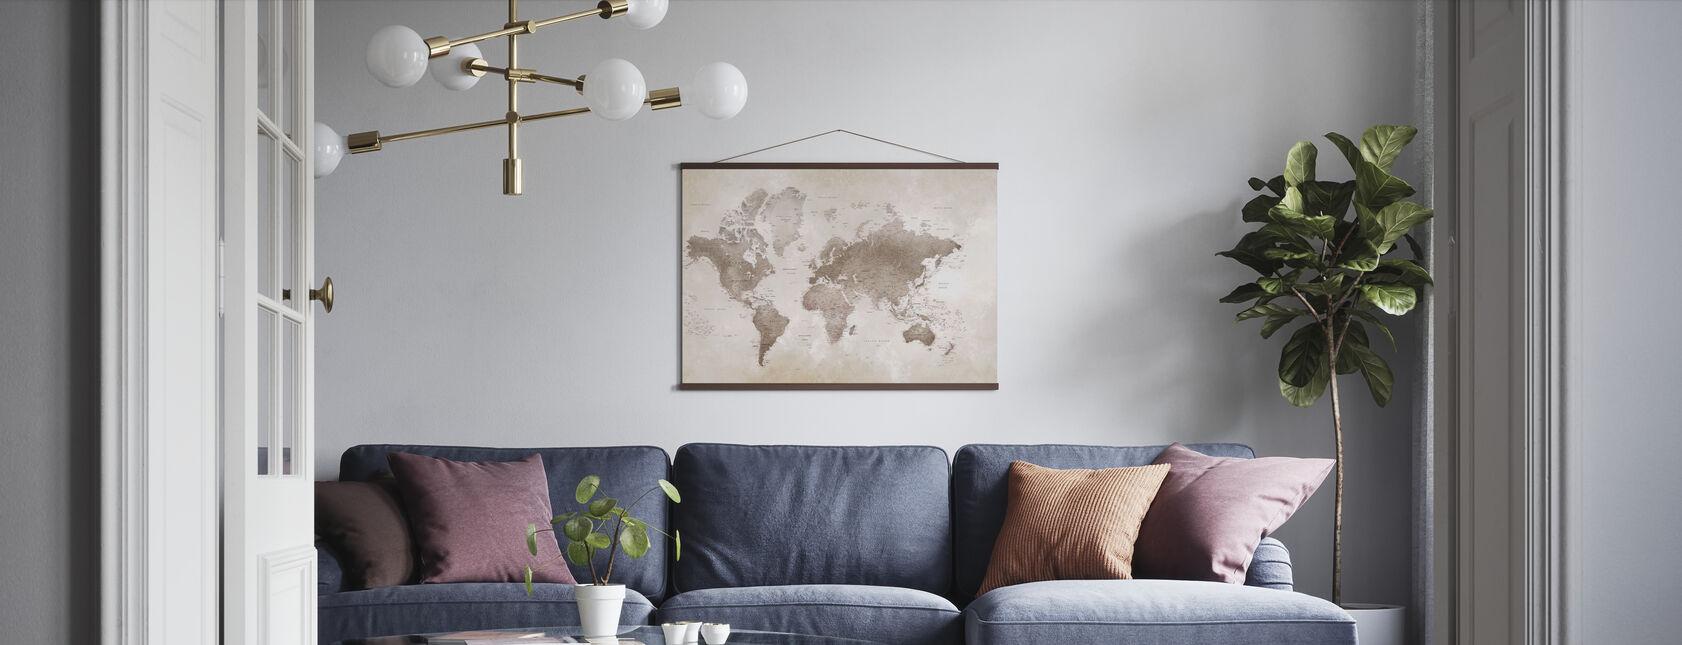 Maailmankartta - Sepia - Juliste - Olohuone